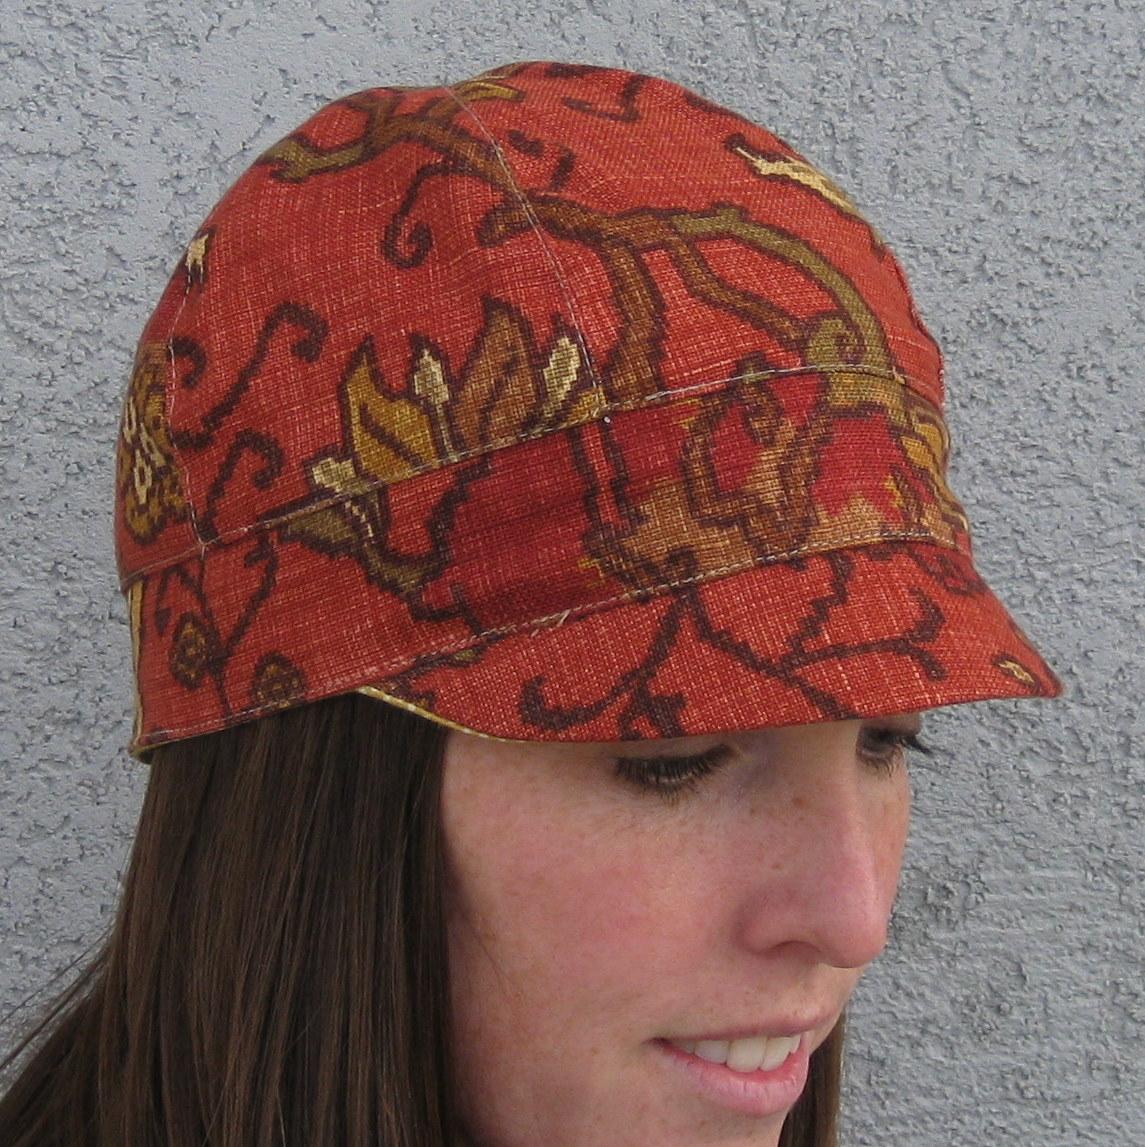 Newsboy hat pattern - Slipcovers by Shelley babb8c299986